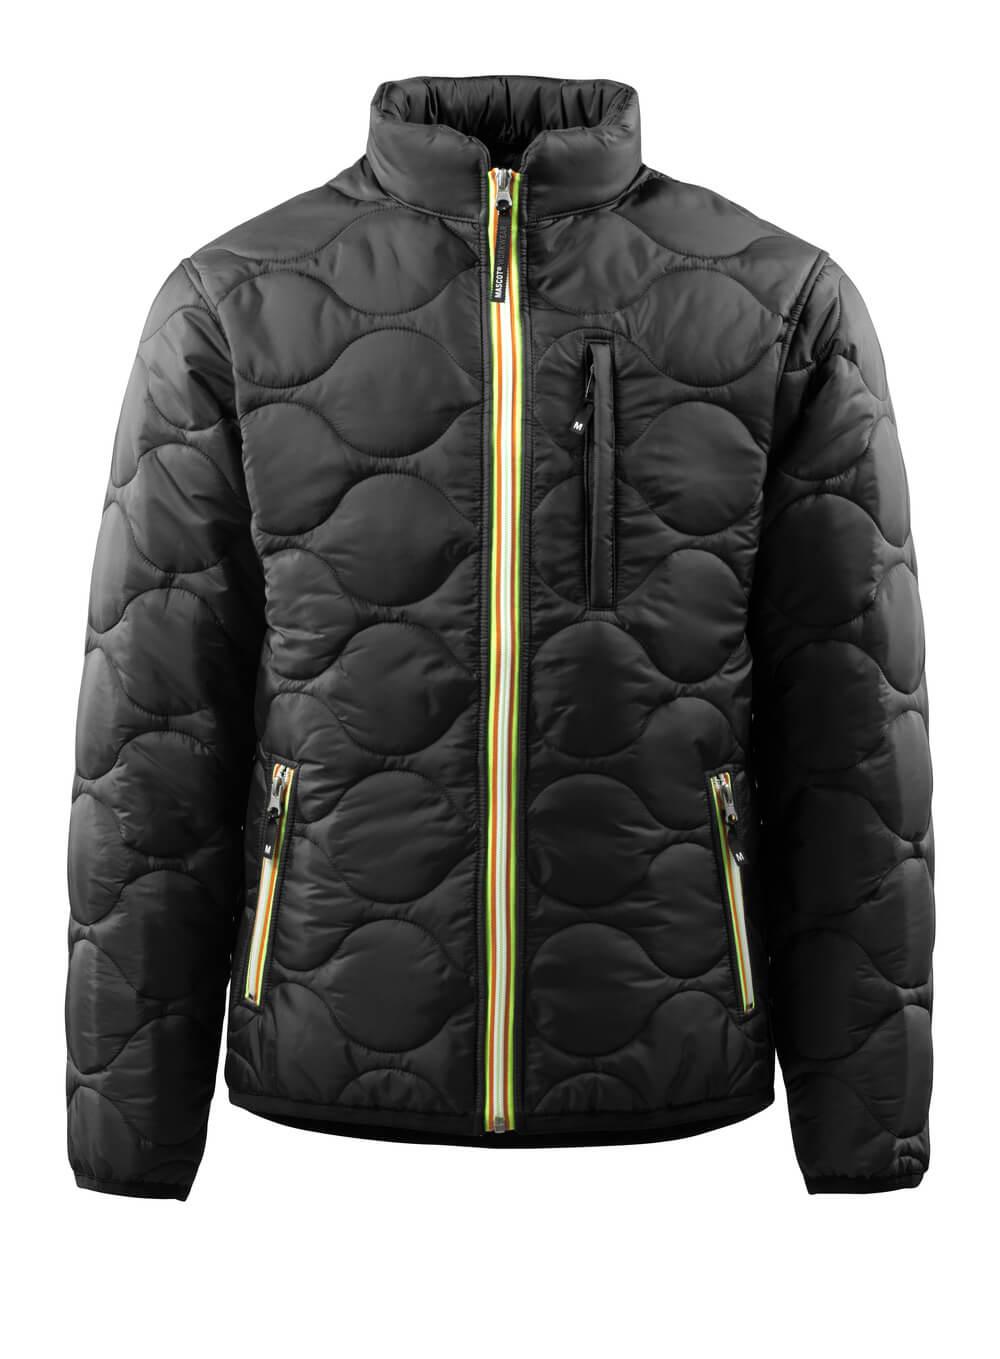 15015-998-09 Termojacka - svart